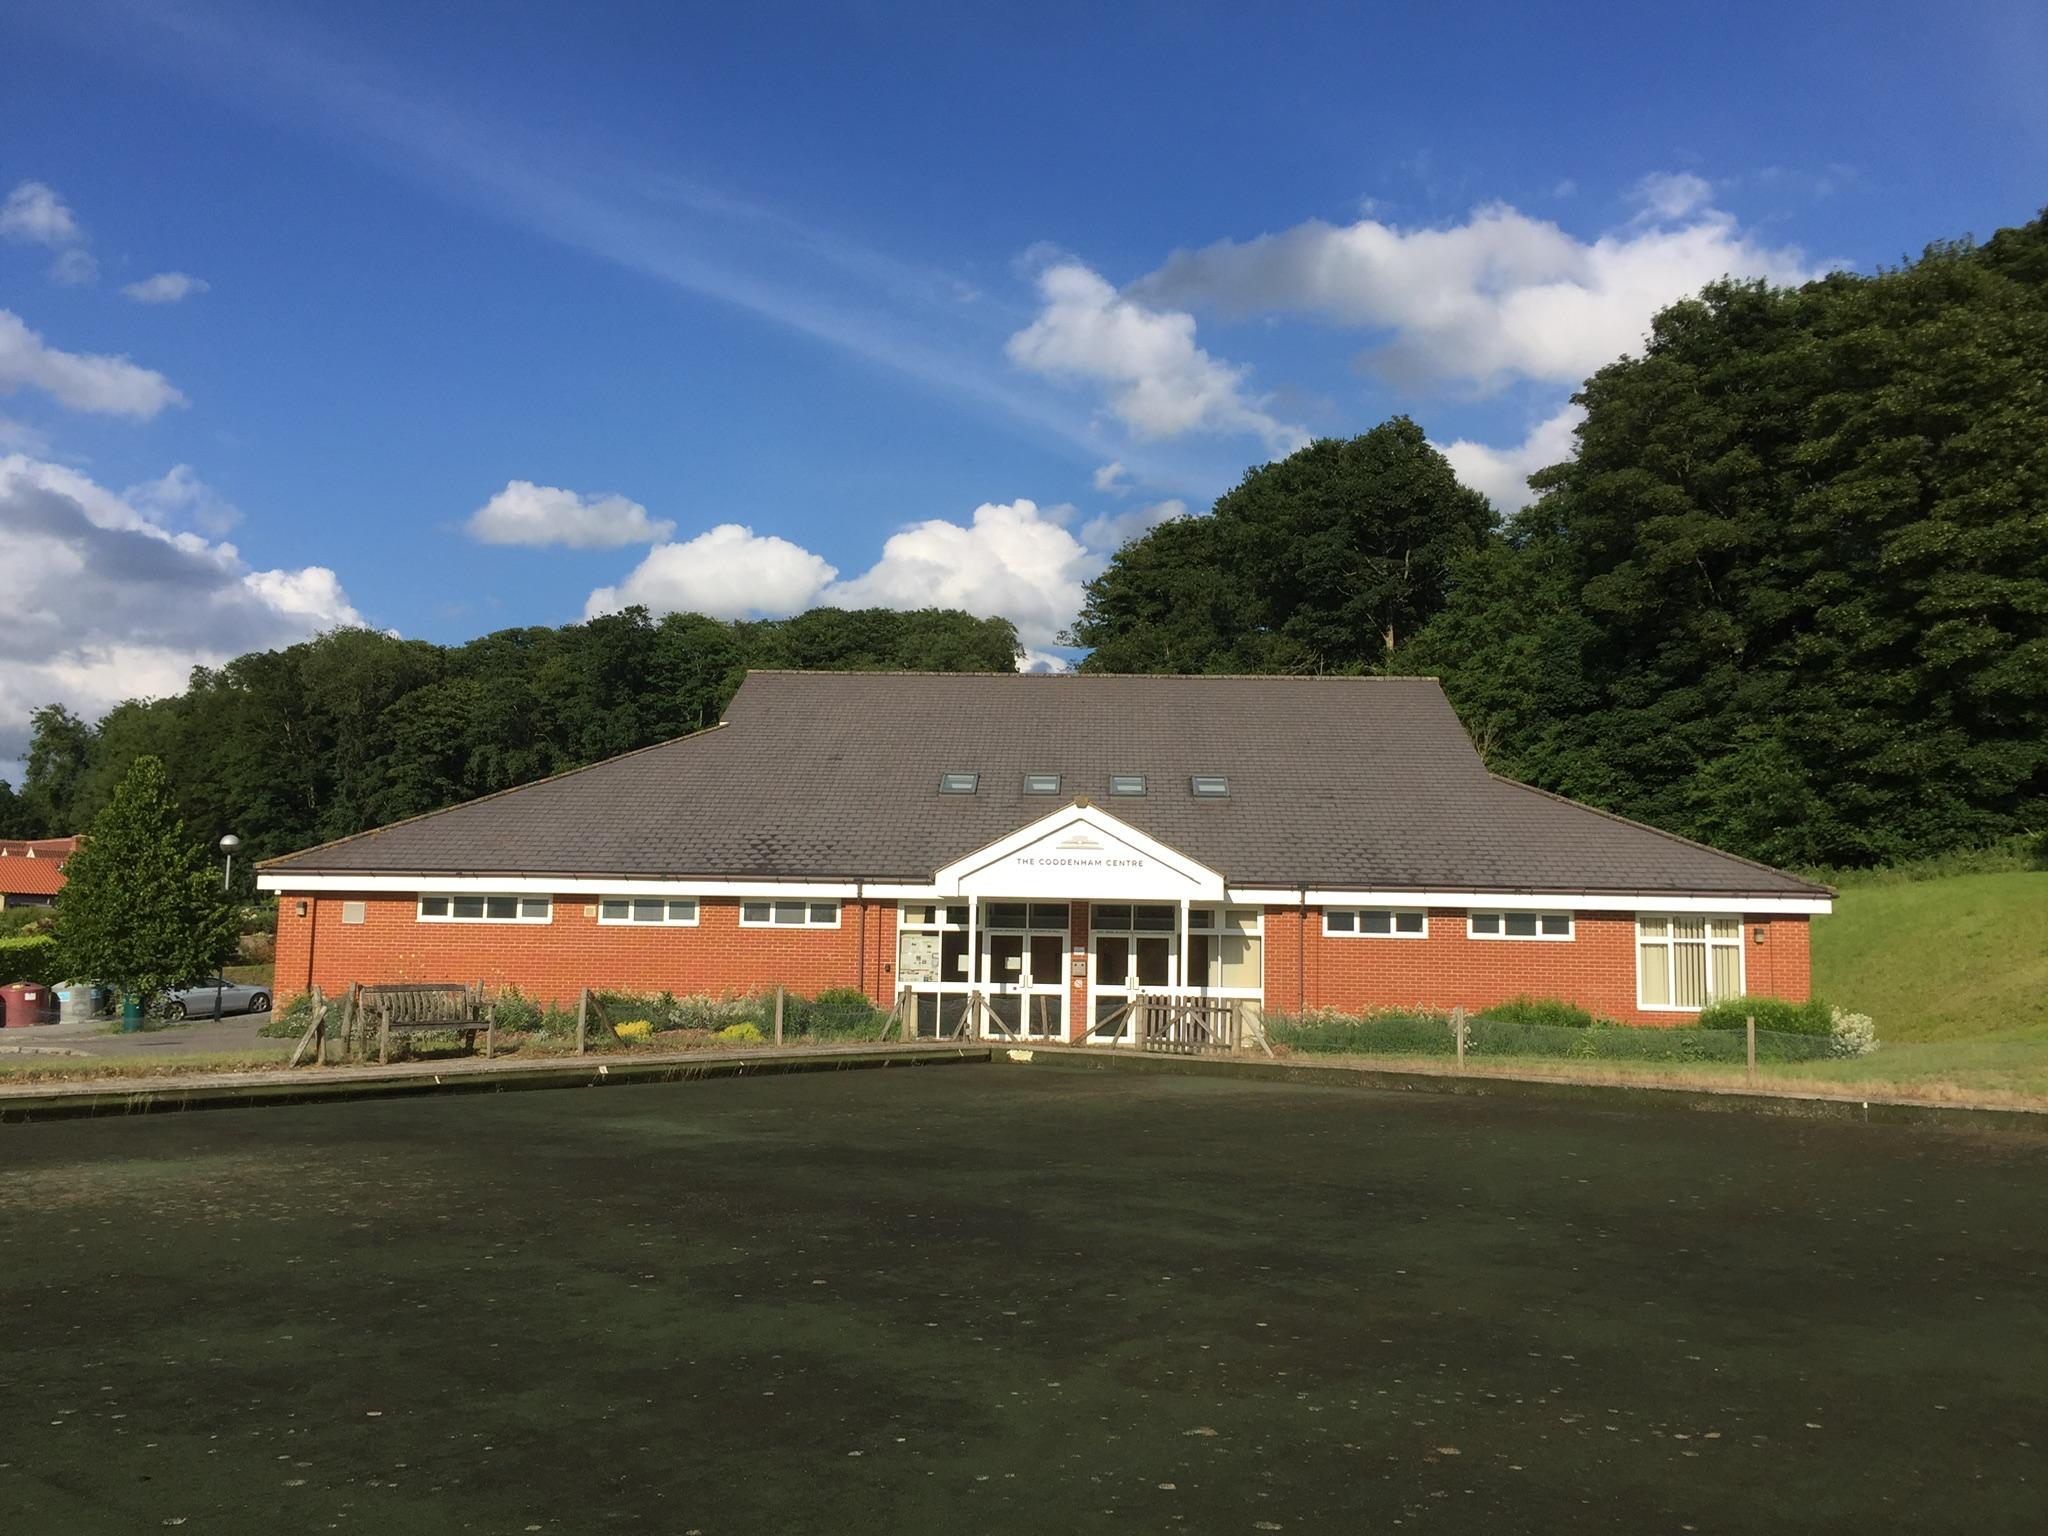 The Coddenham Centre front view